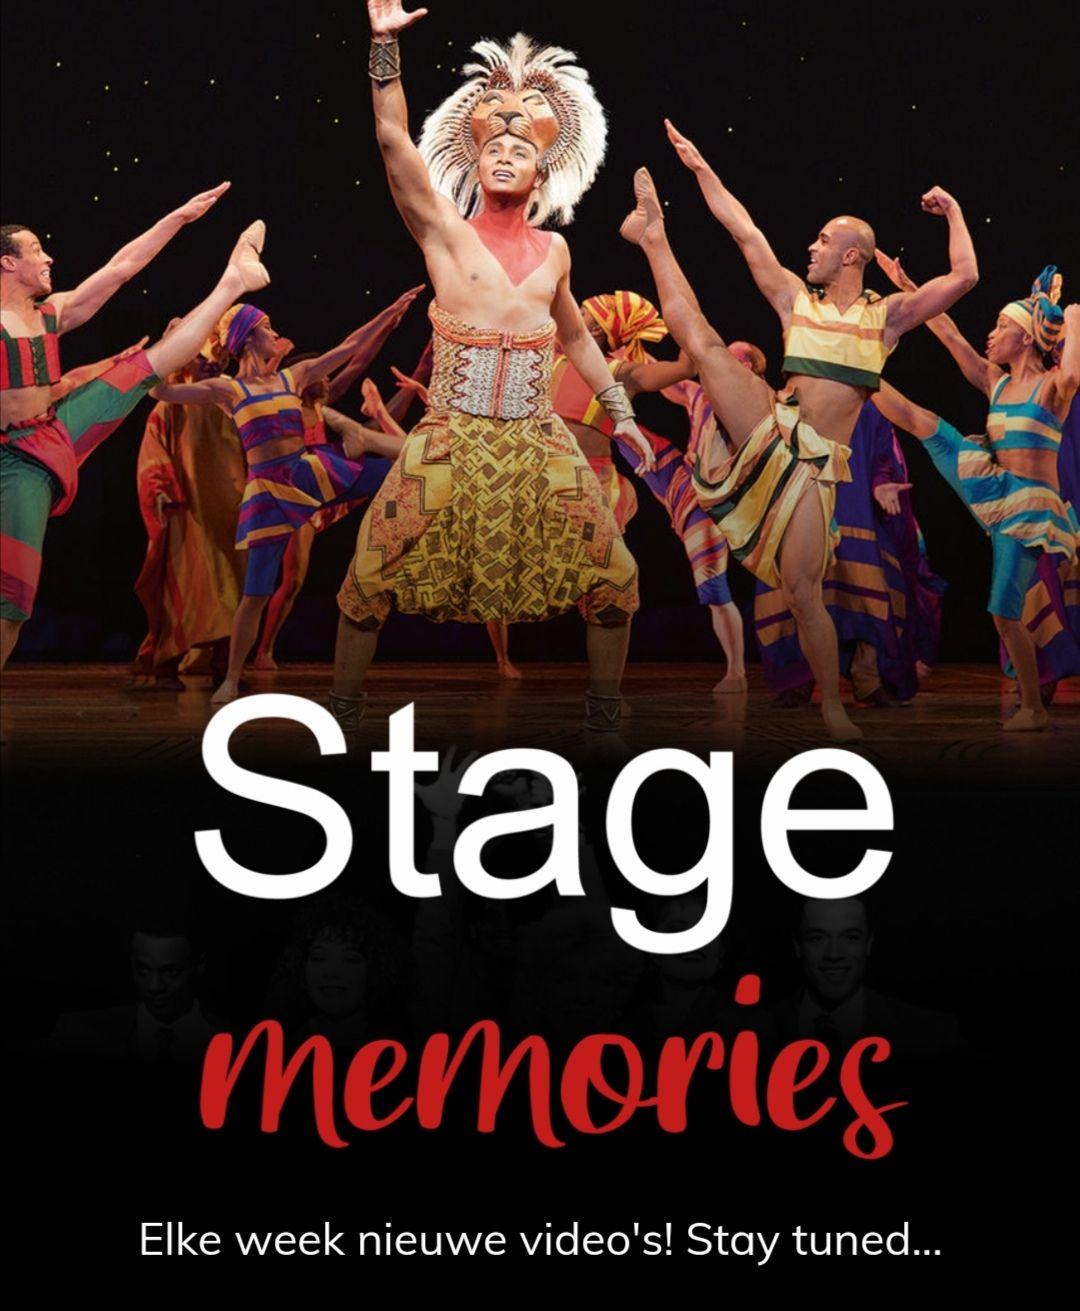 Iedere week gratis online musicals bij Stage Entertainment.